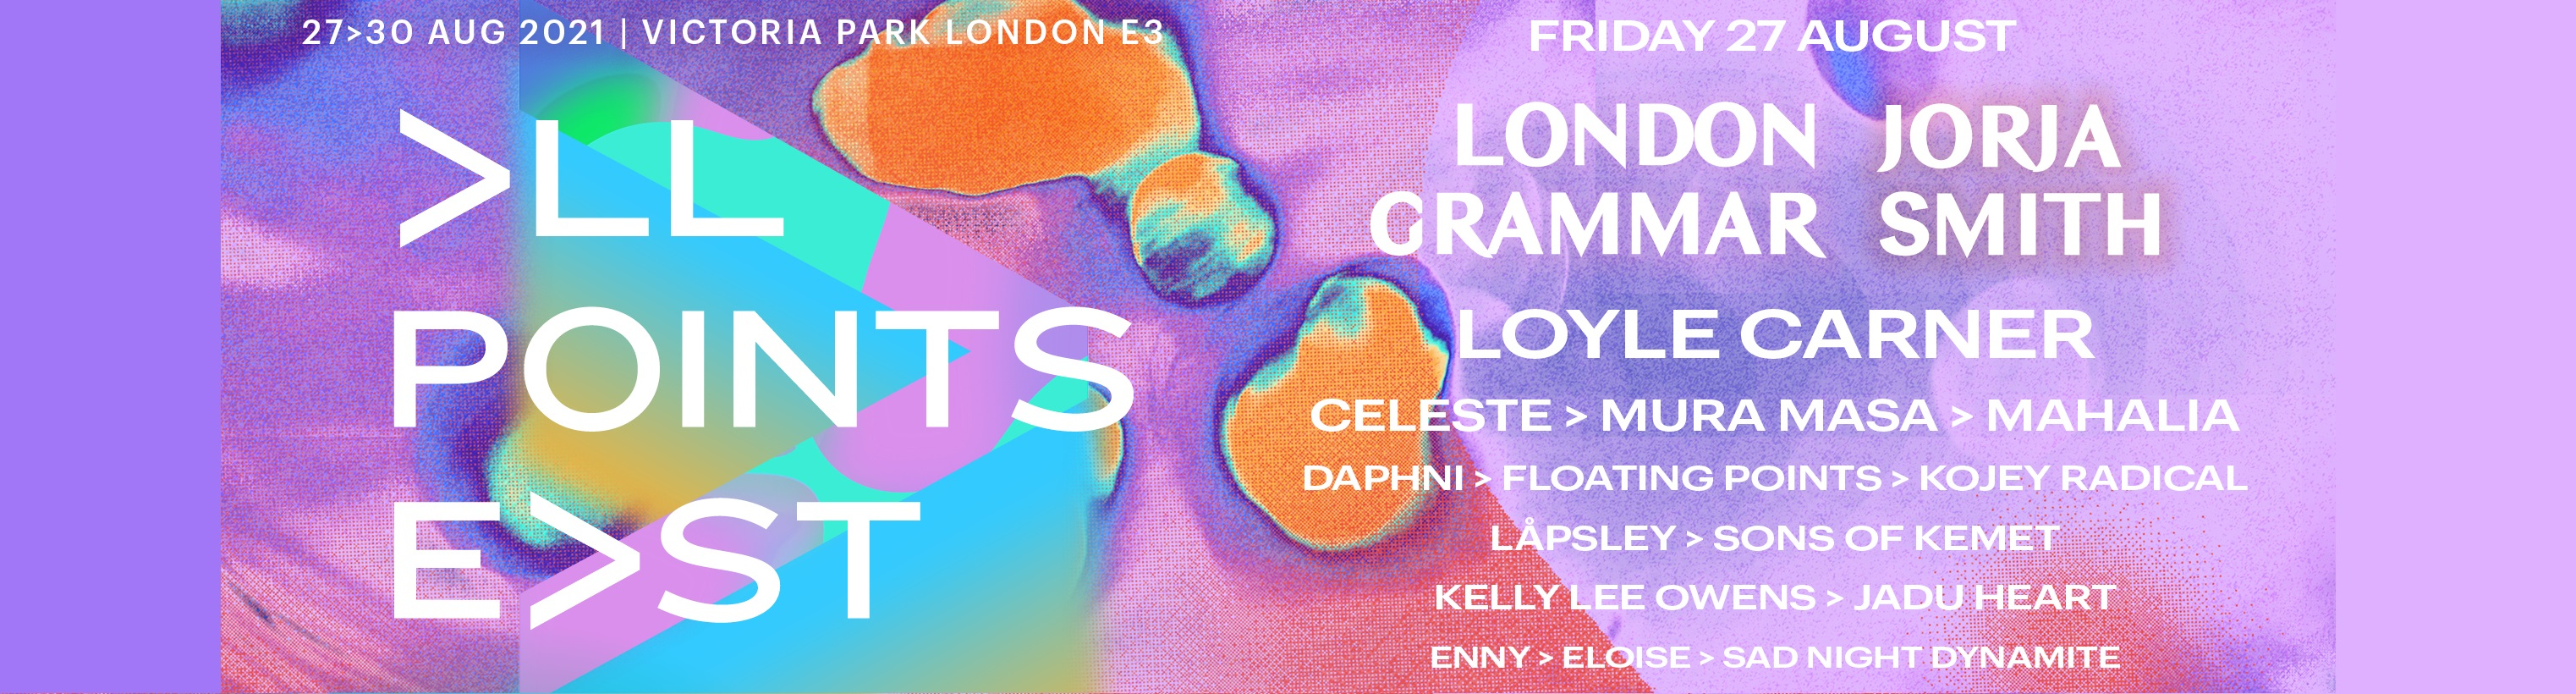 All Points East - London Grammar + Jorja Smith